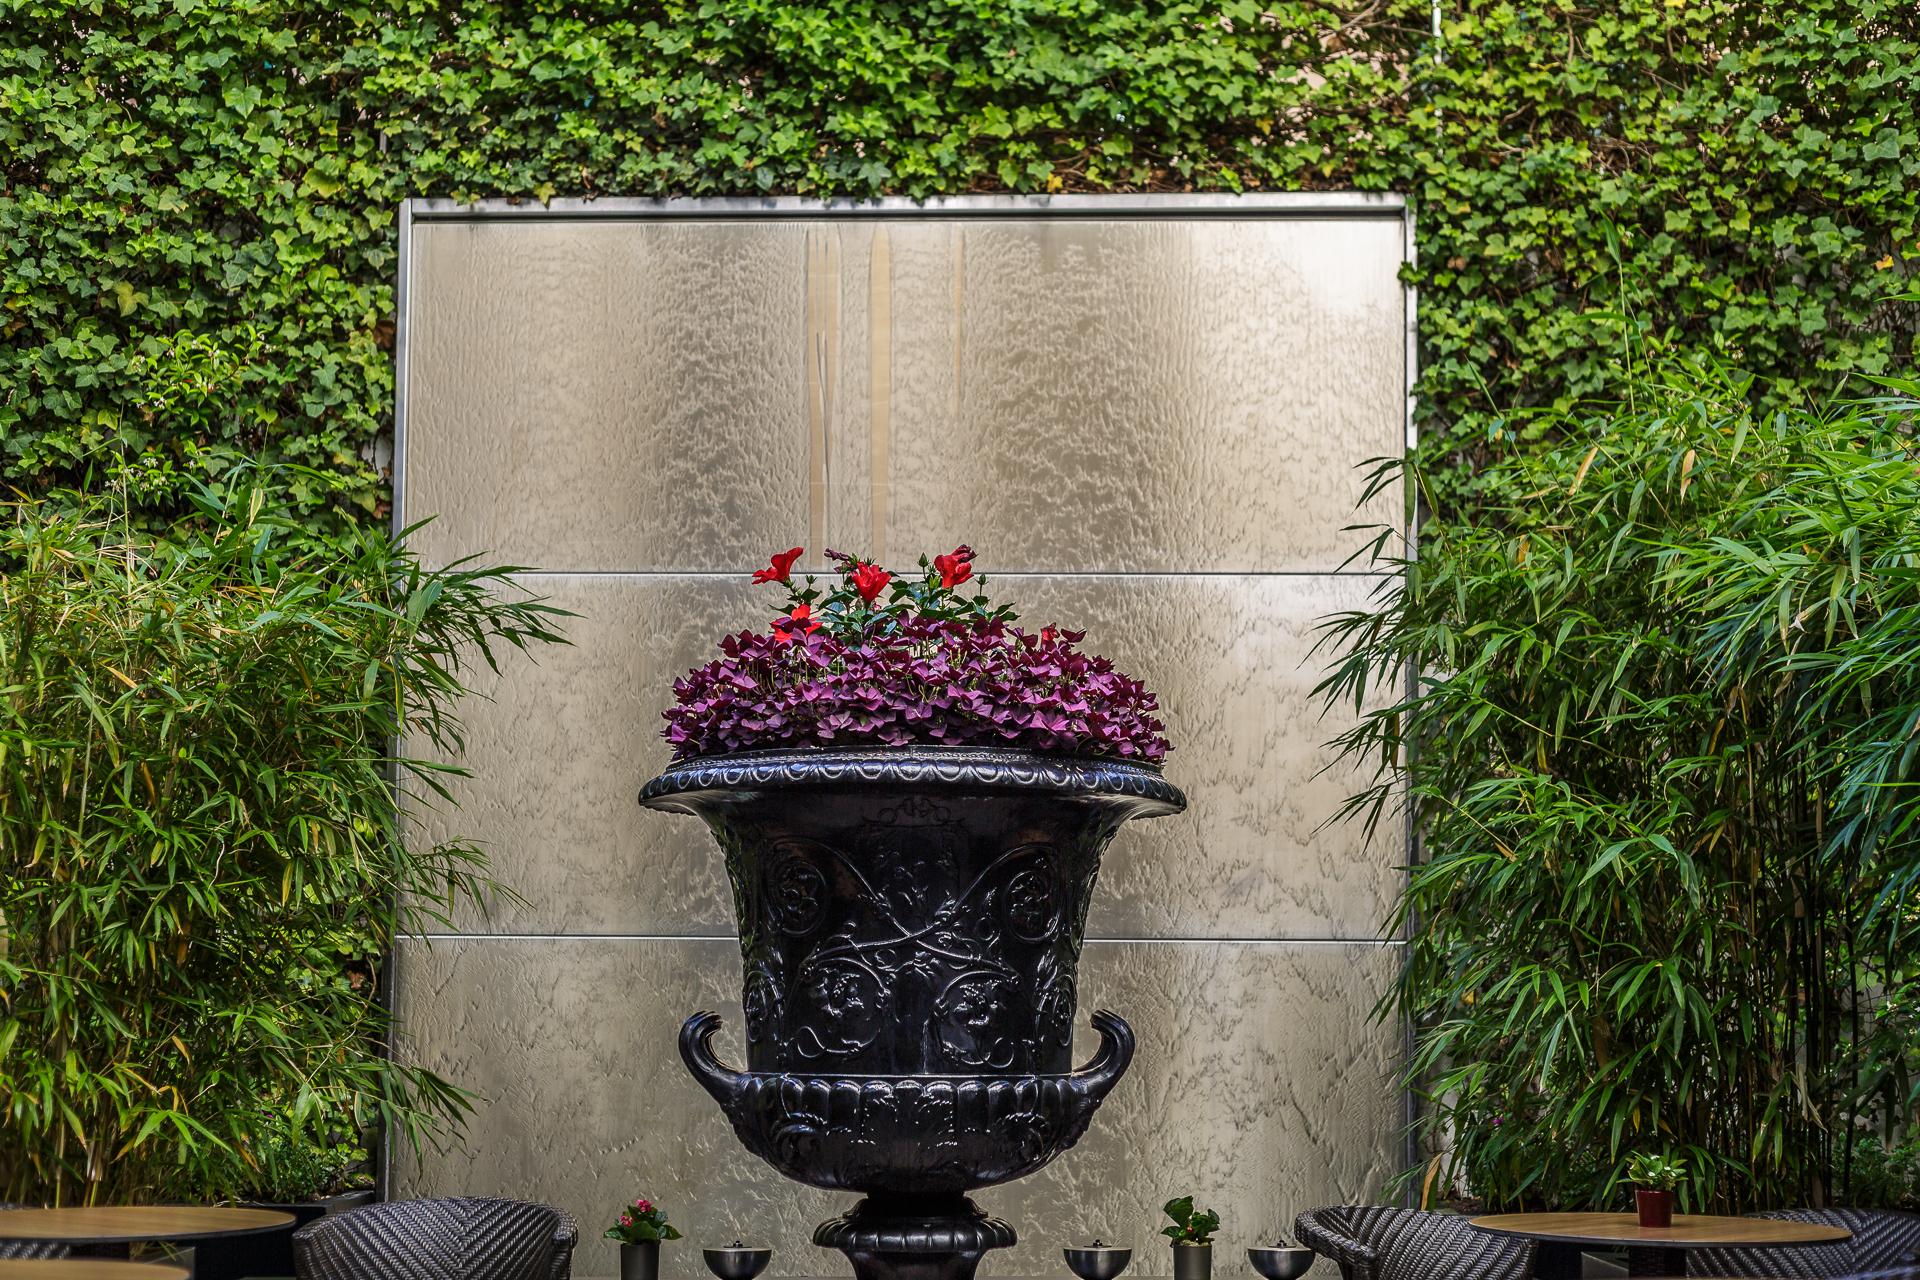 eastwest-hotel-garden